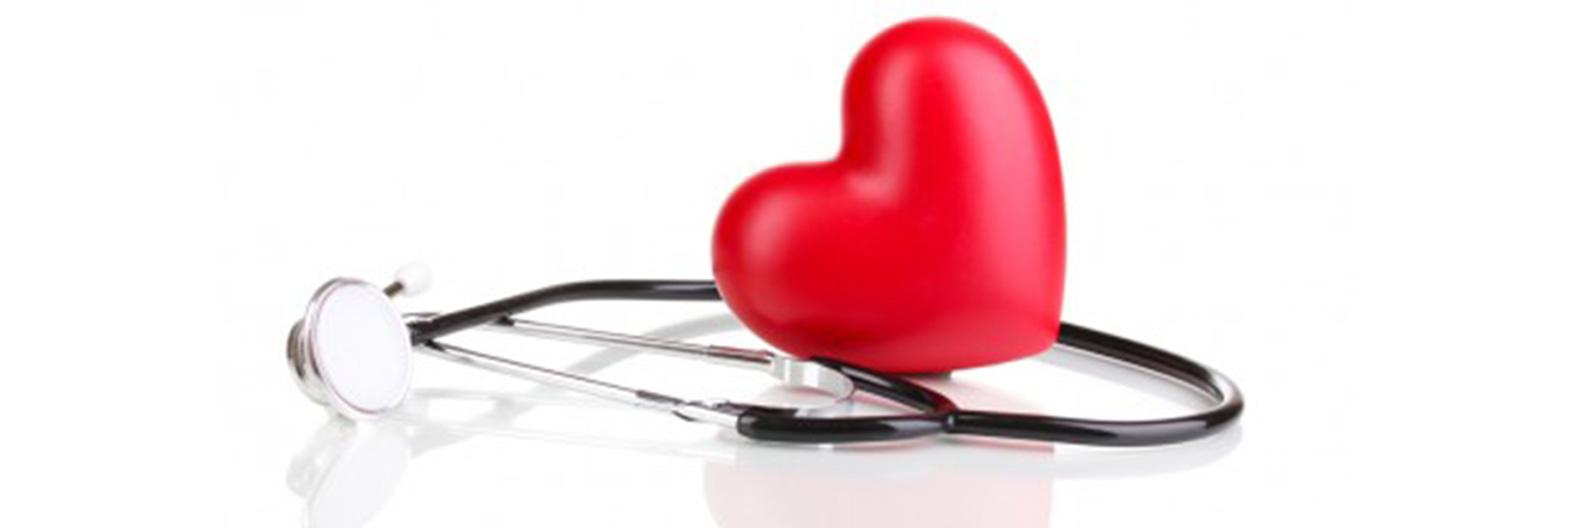 hipertenzija dėl ko